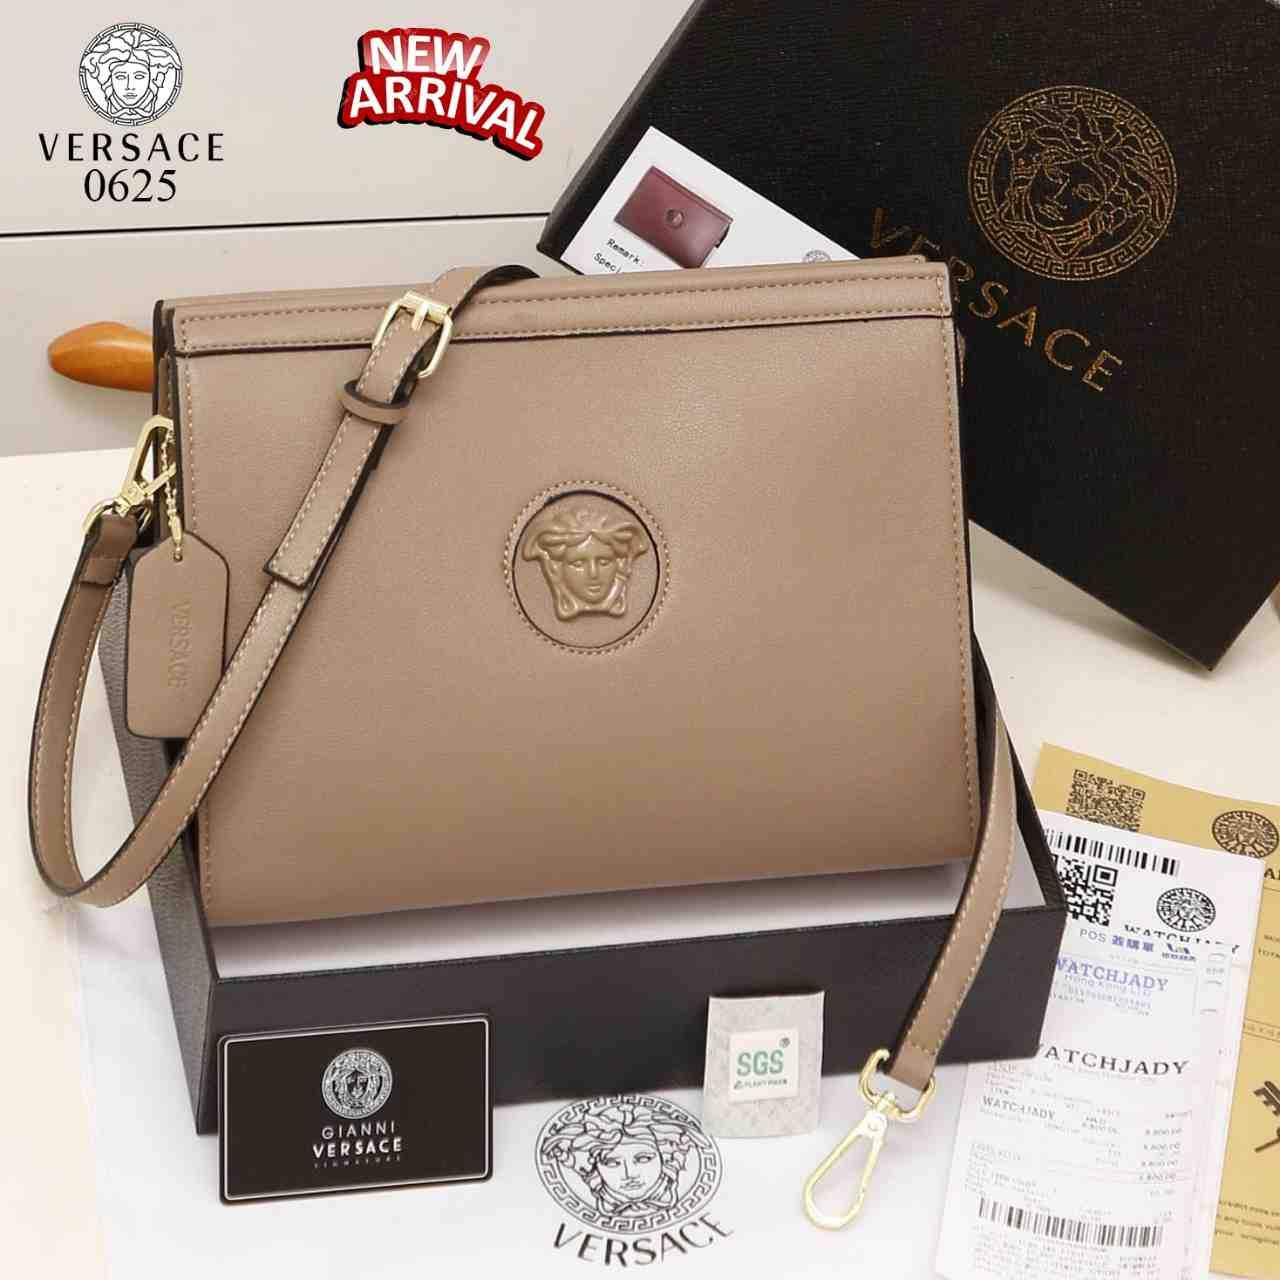 Tas HANDBAG WANITA TERBARU Gianni Versace Spring Summer Handbag 0625 Semi Ori Kode FAS648 3